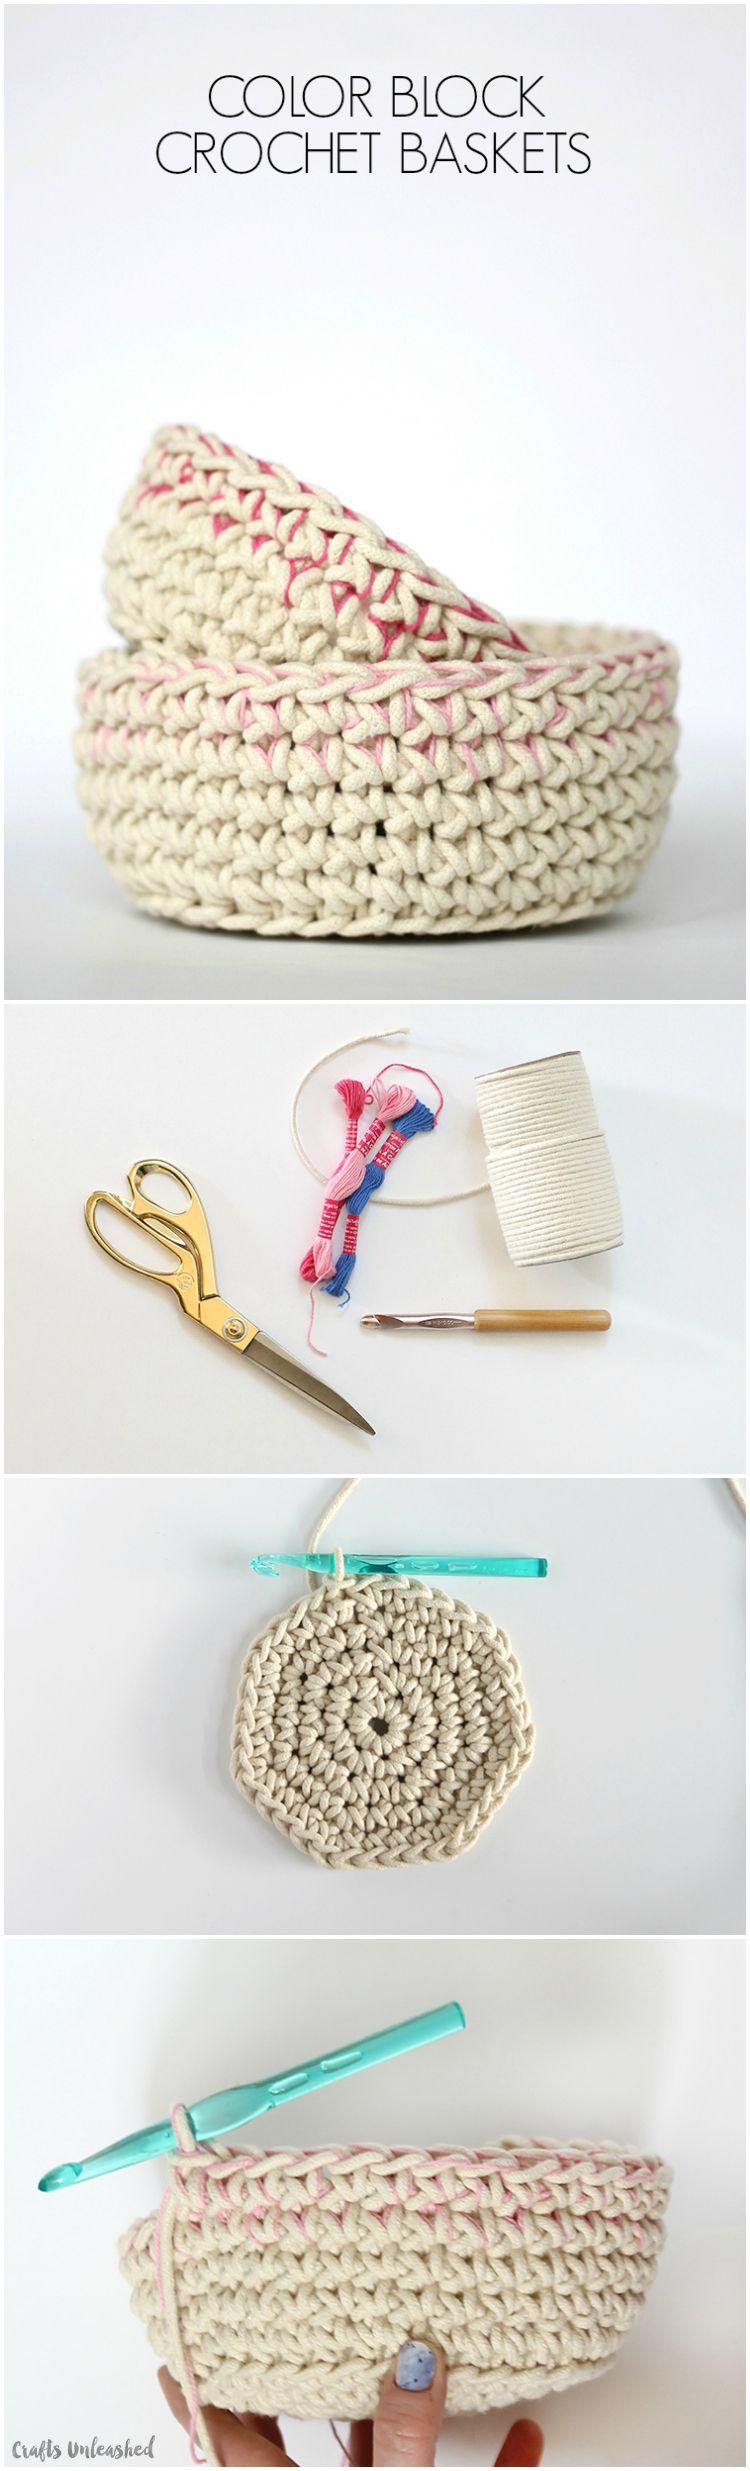 Crochet Basket Pattern with Colorblock Technique | Totoro, Hilo y Tejido